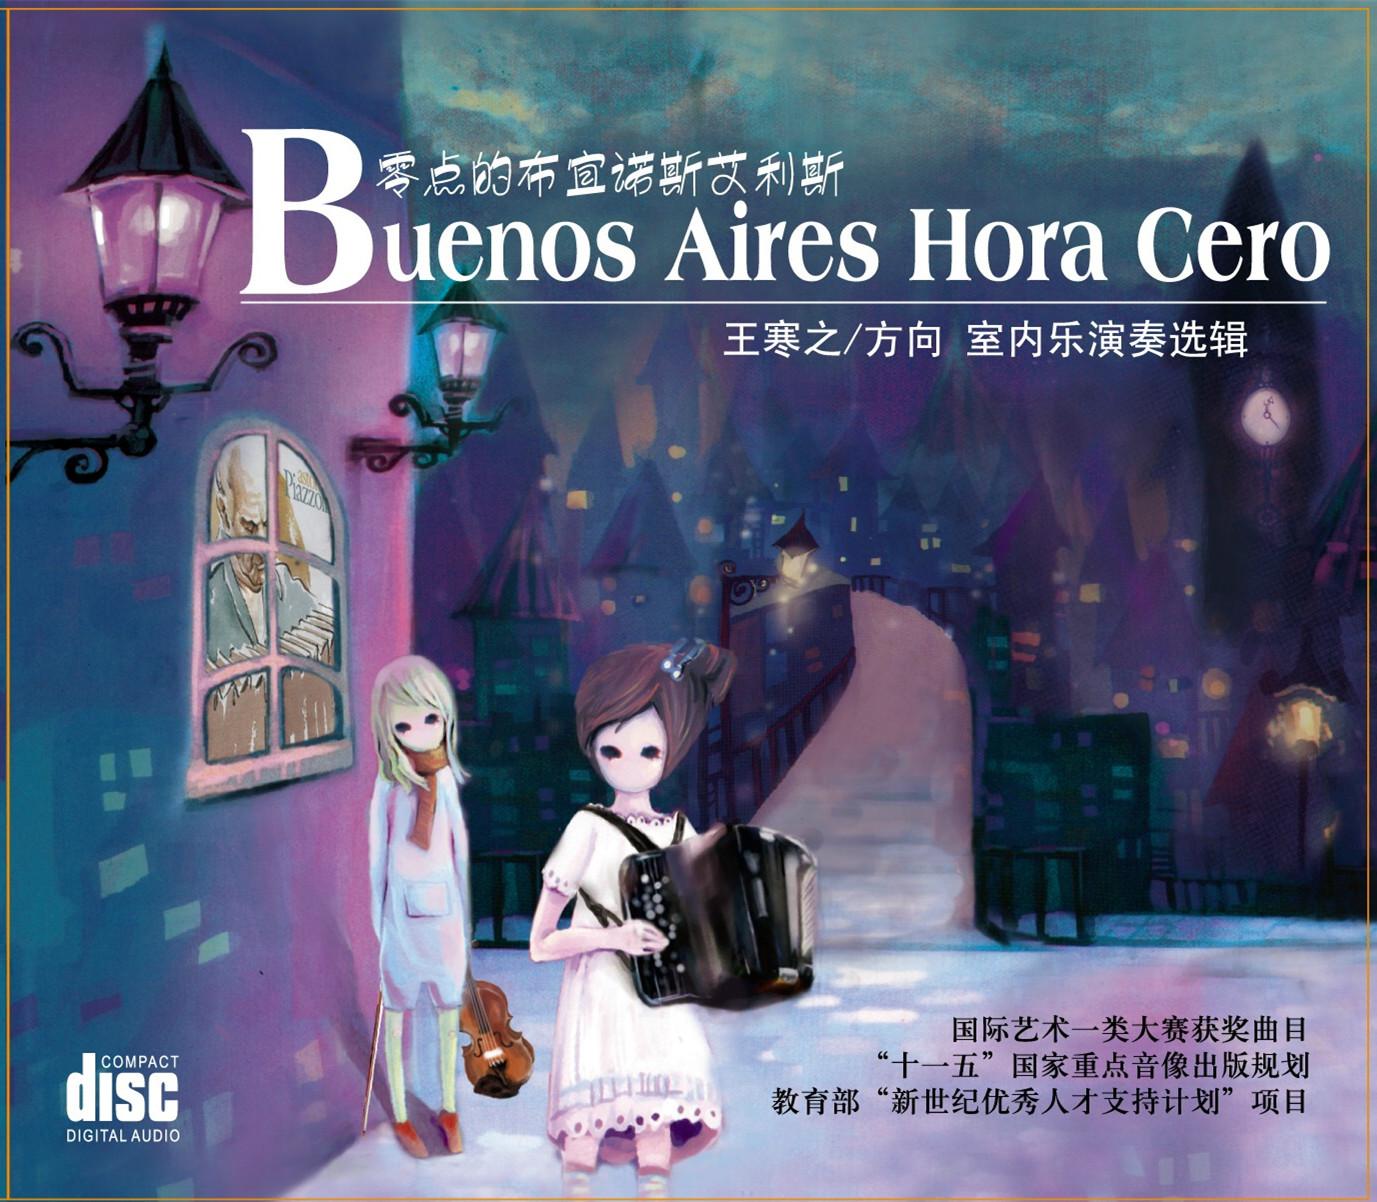 Audio_Buenos Aires Hora Cero音频文件封面图